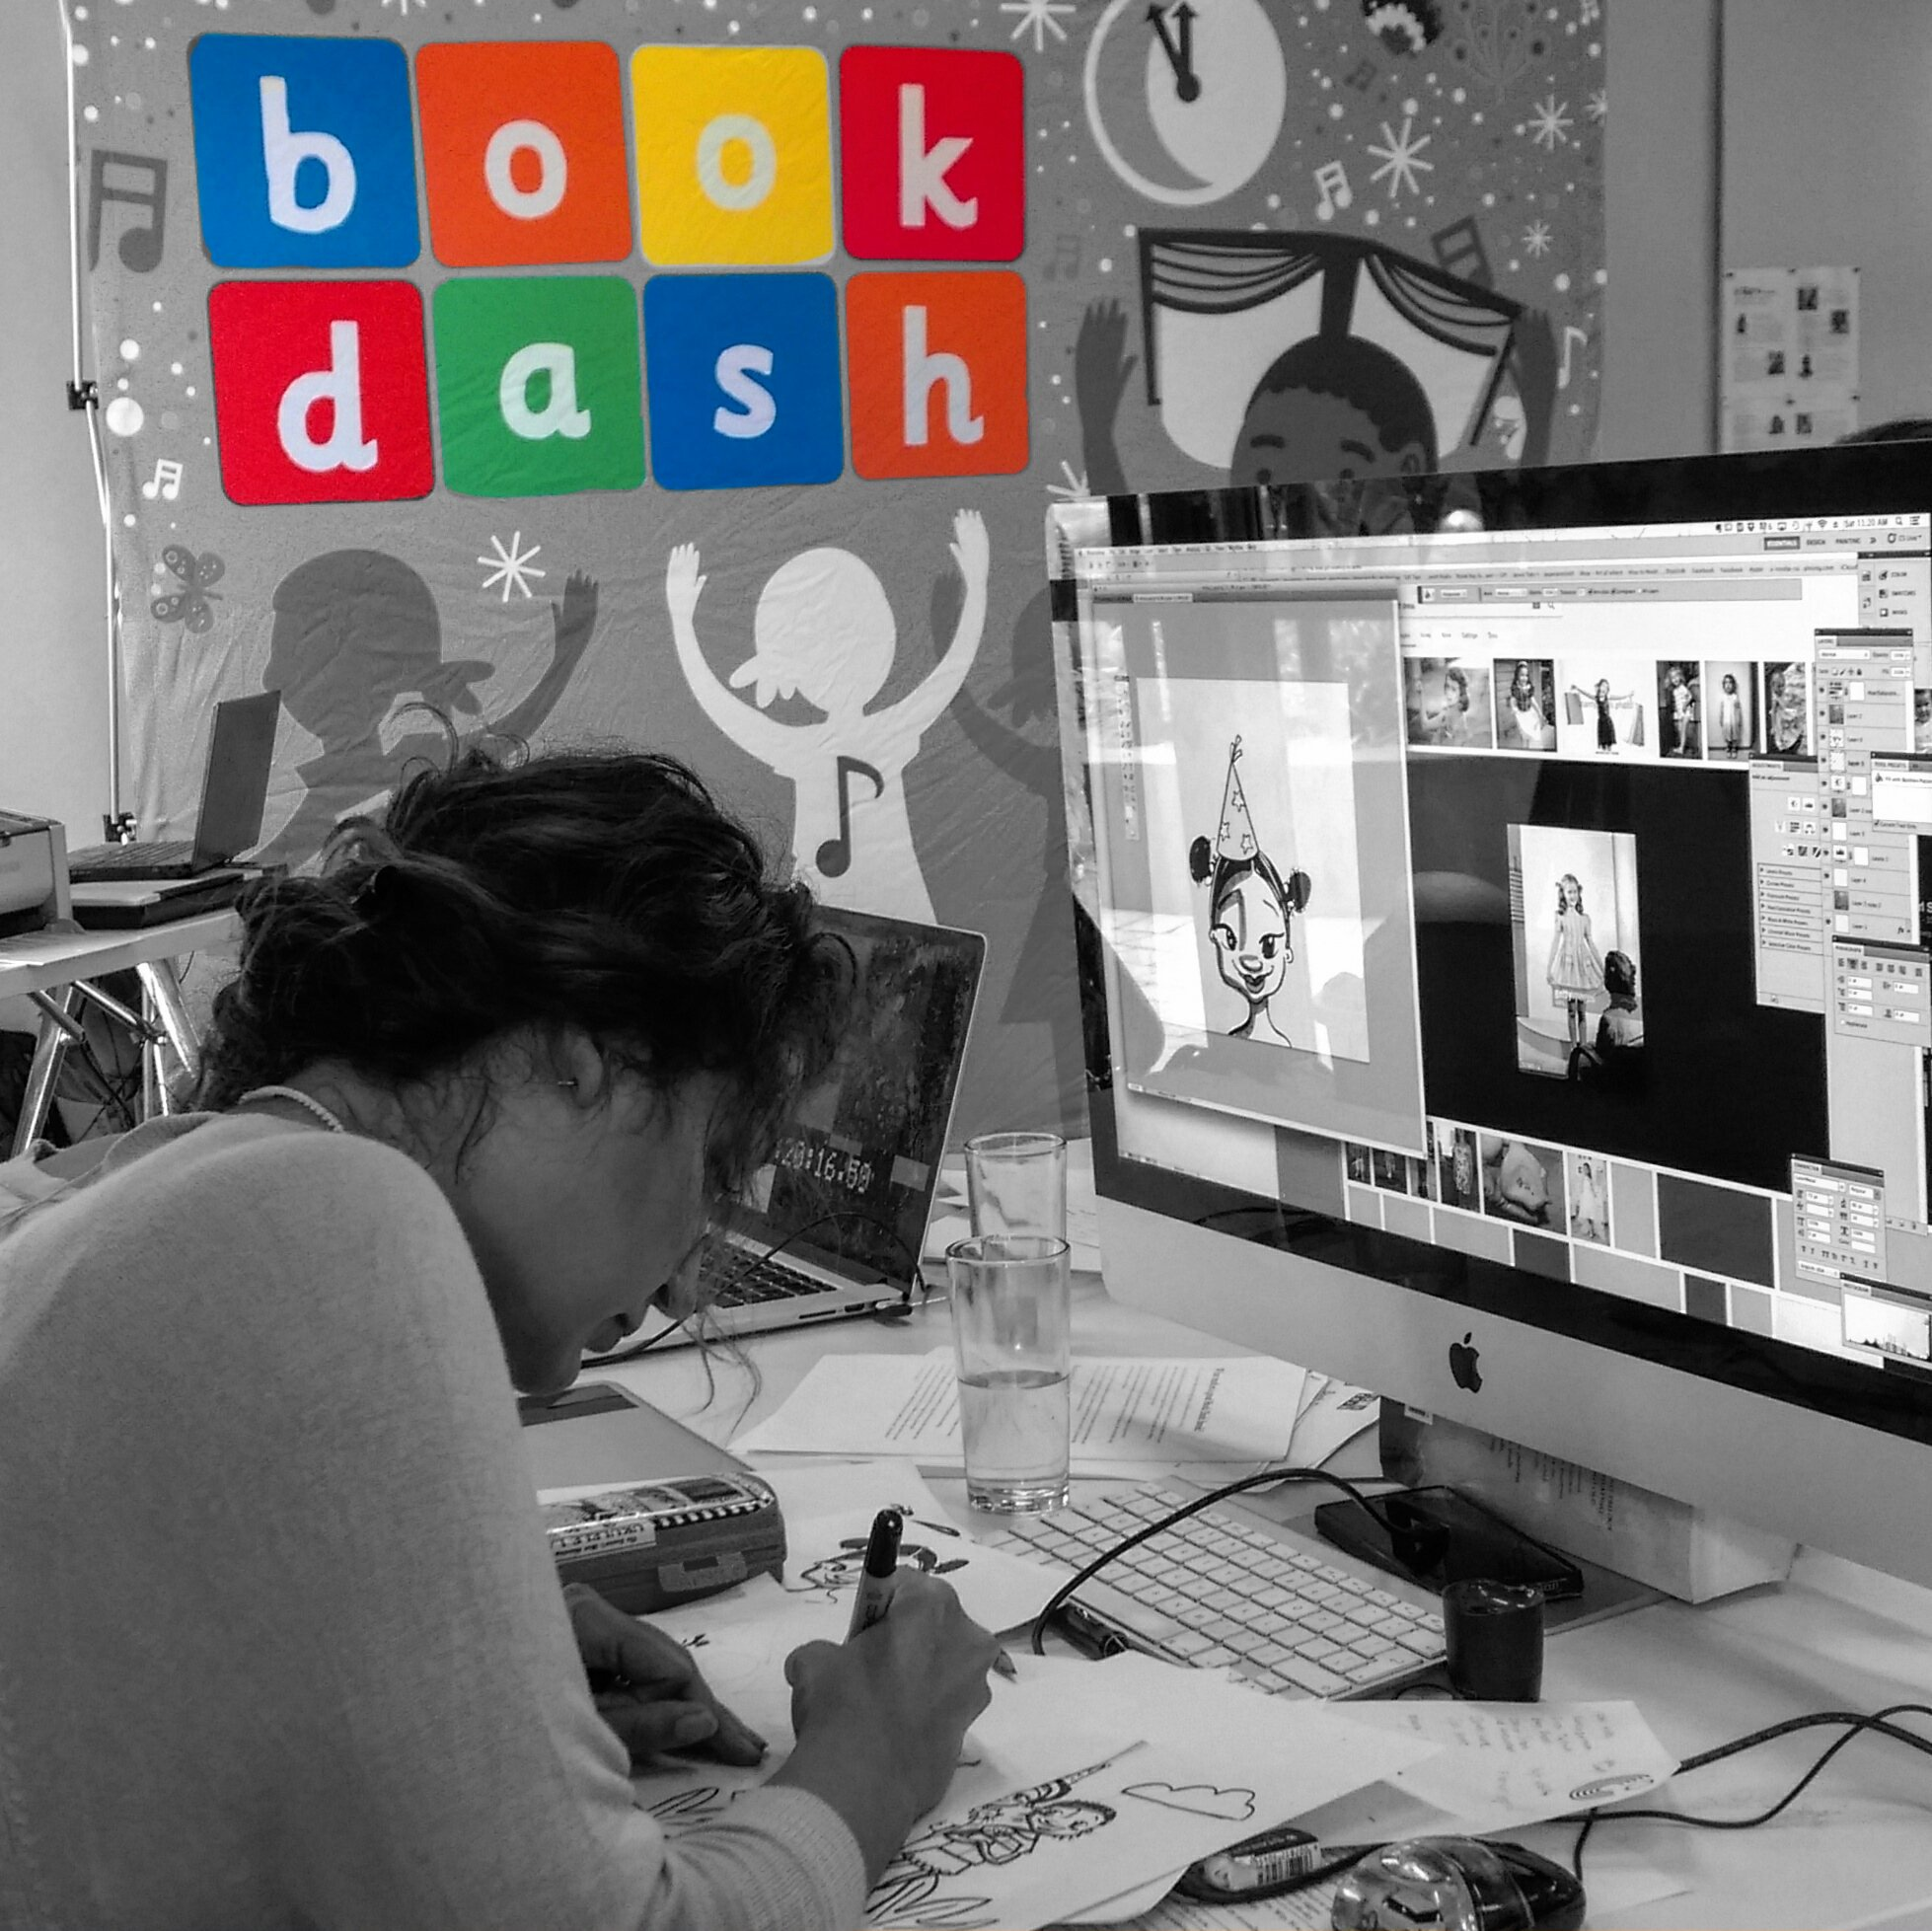 Nicci illustrating children's book Mina and the Birthday Dress at @bookdash. #BookDash #BookDashPlus @goethejoburg @worldreaders https://t.co/3SuxnZMDXb